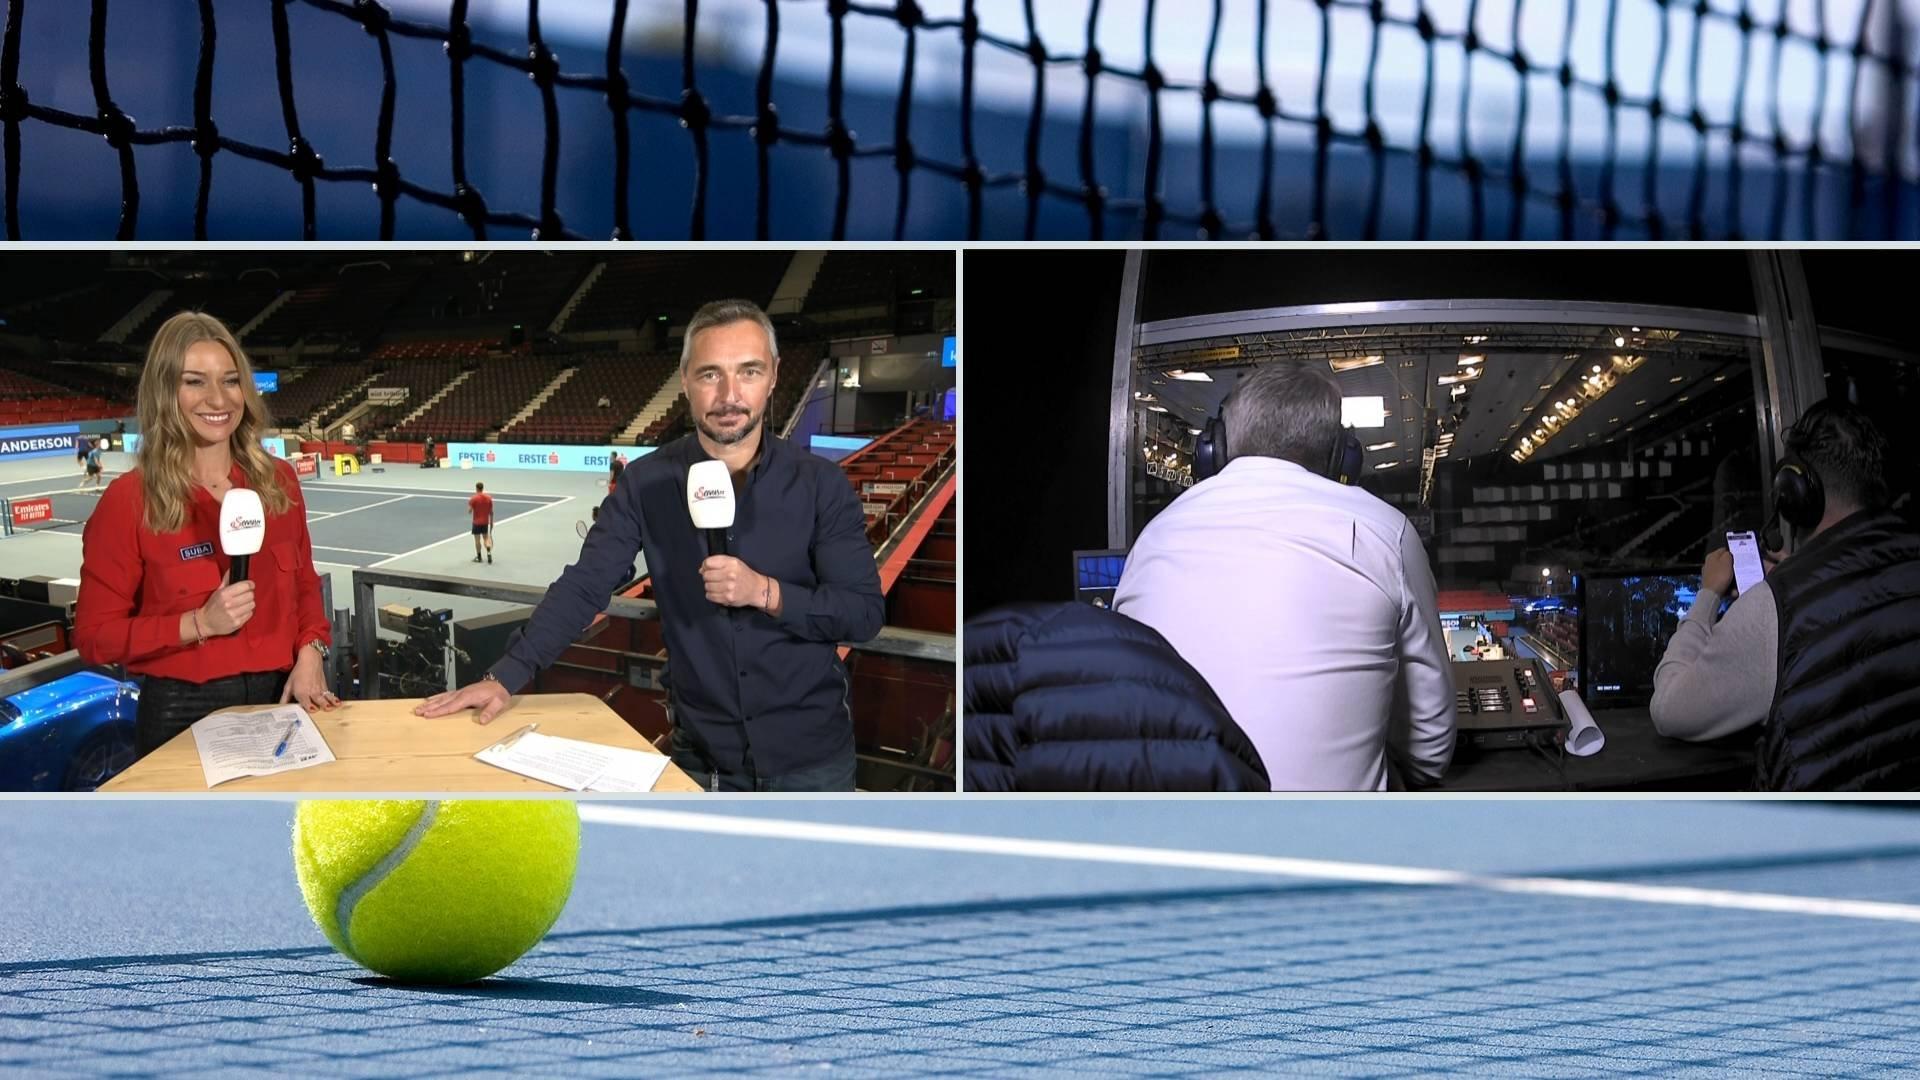 Aut26 Tennis Wien_0160 12566_H_6333_20201026_114735.jpg